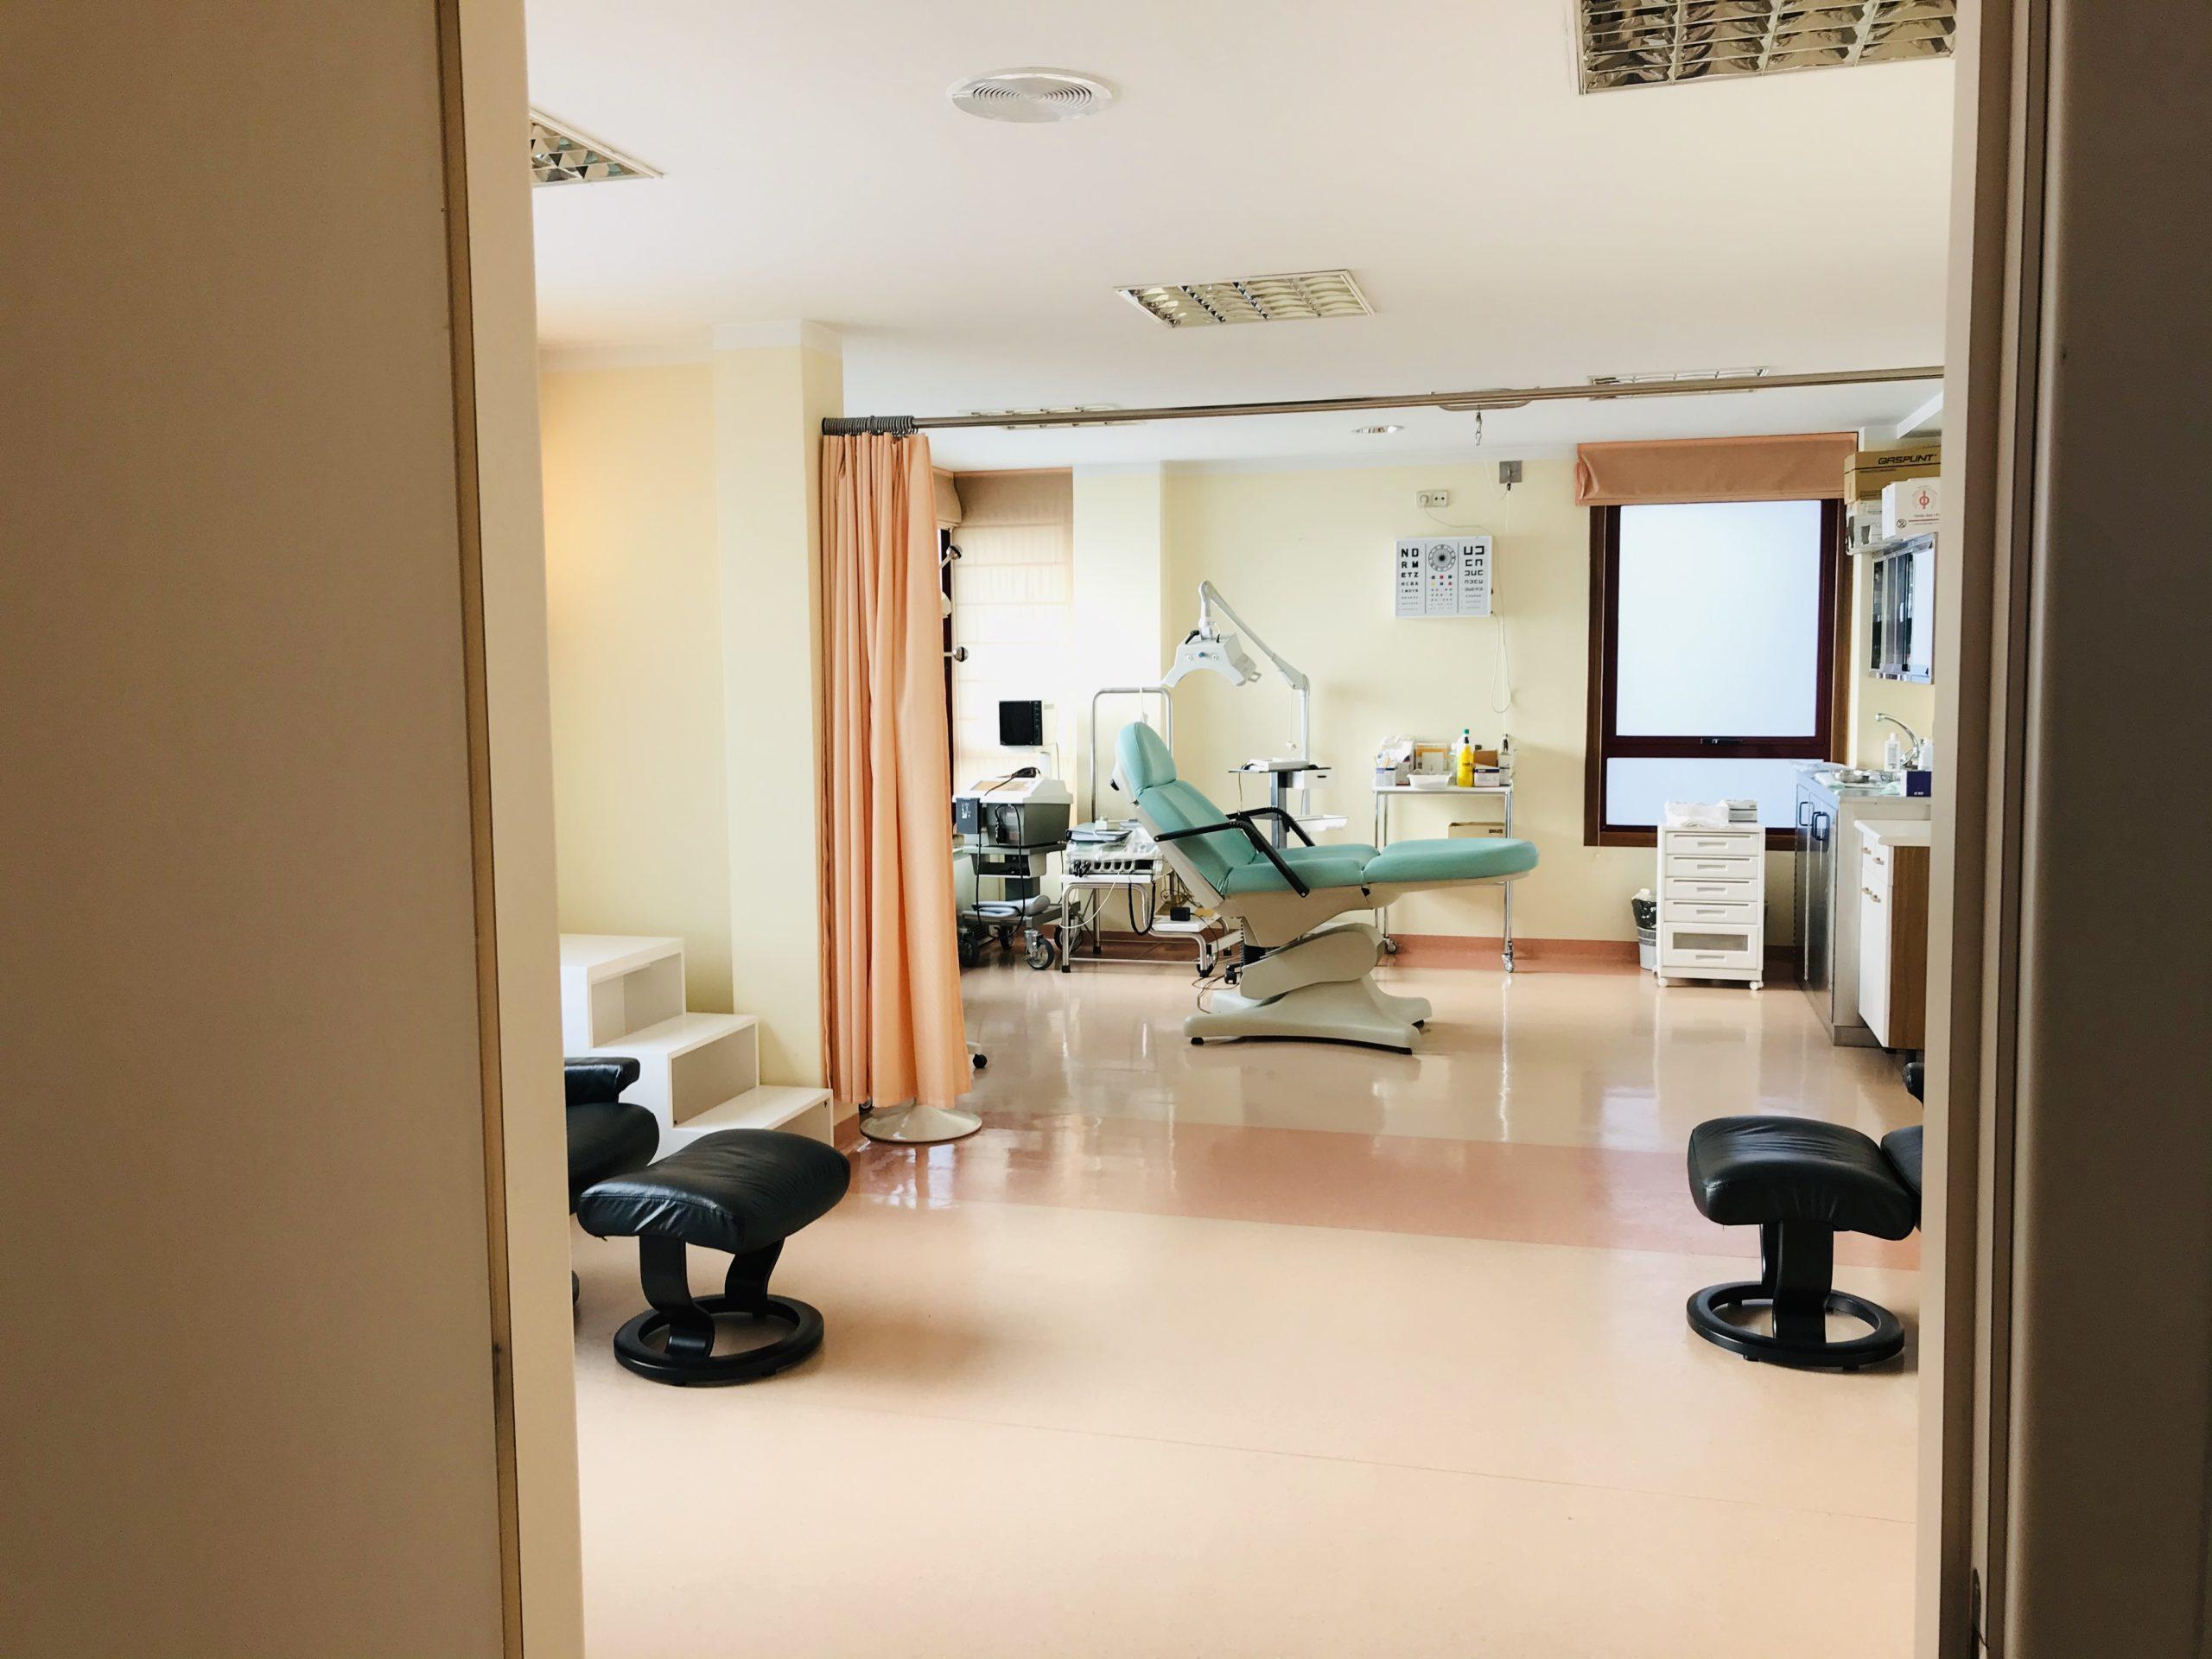 Edificio Exclusivo – Centro médico en Vigo en venta